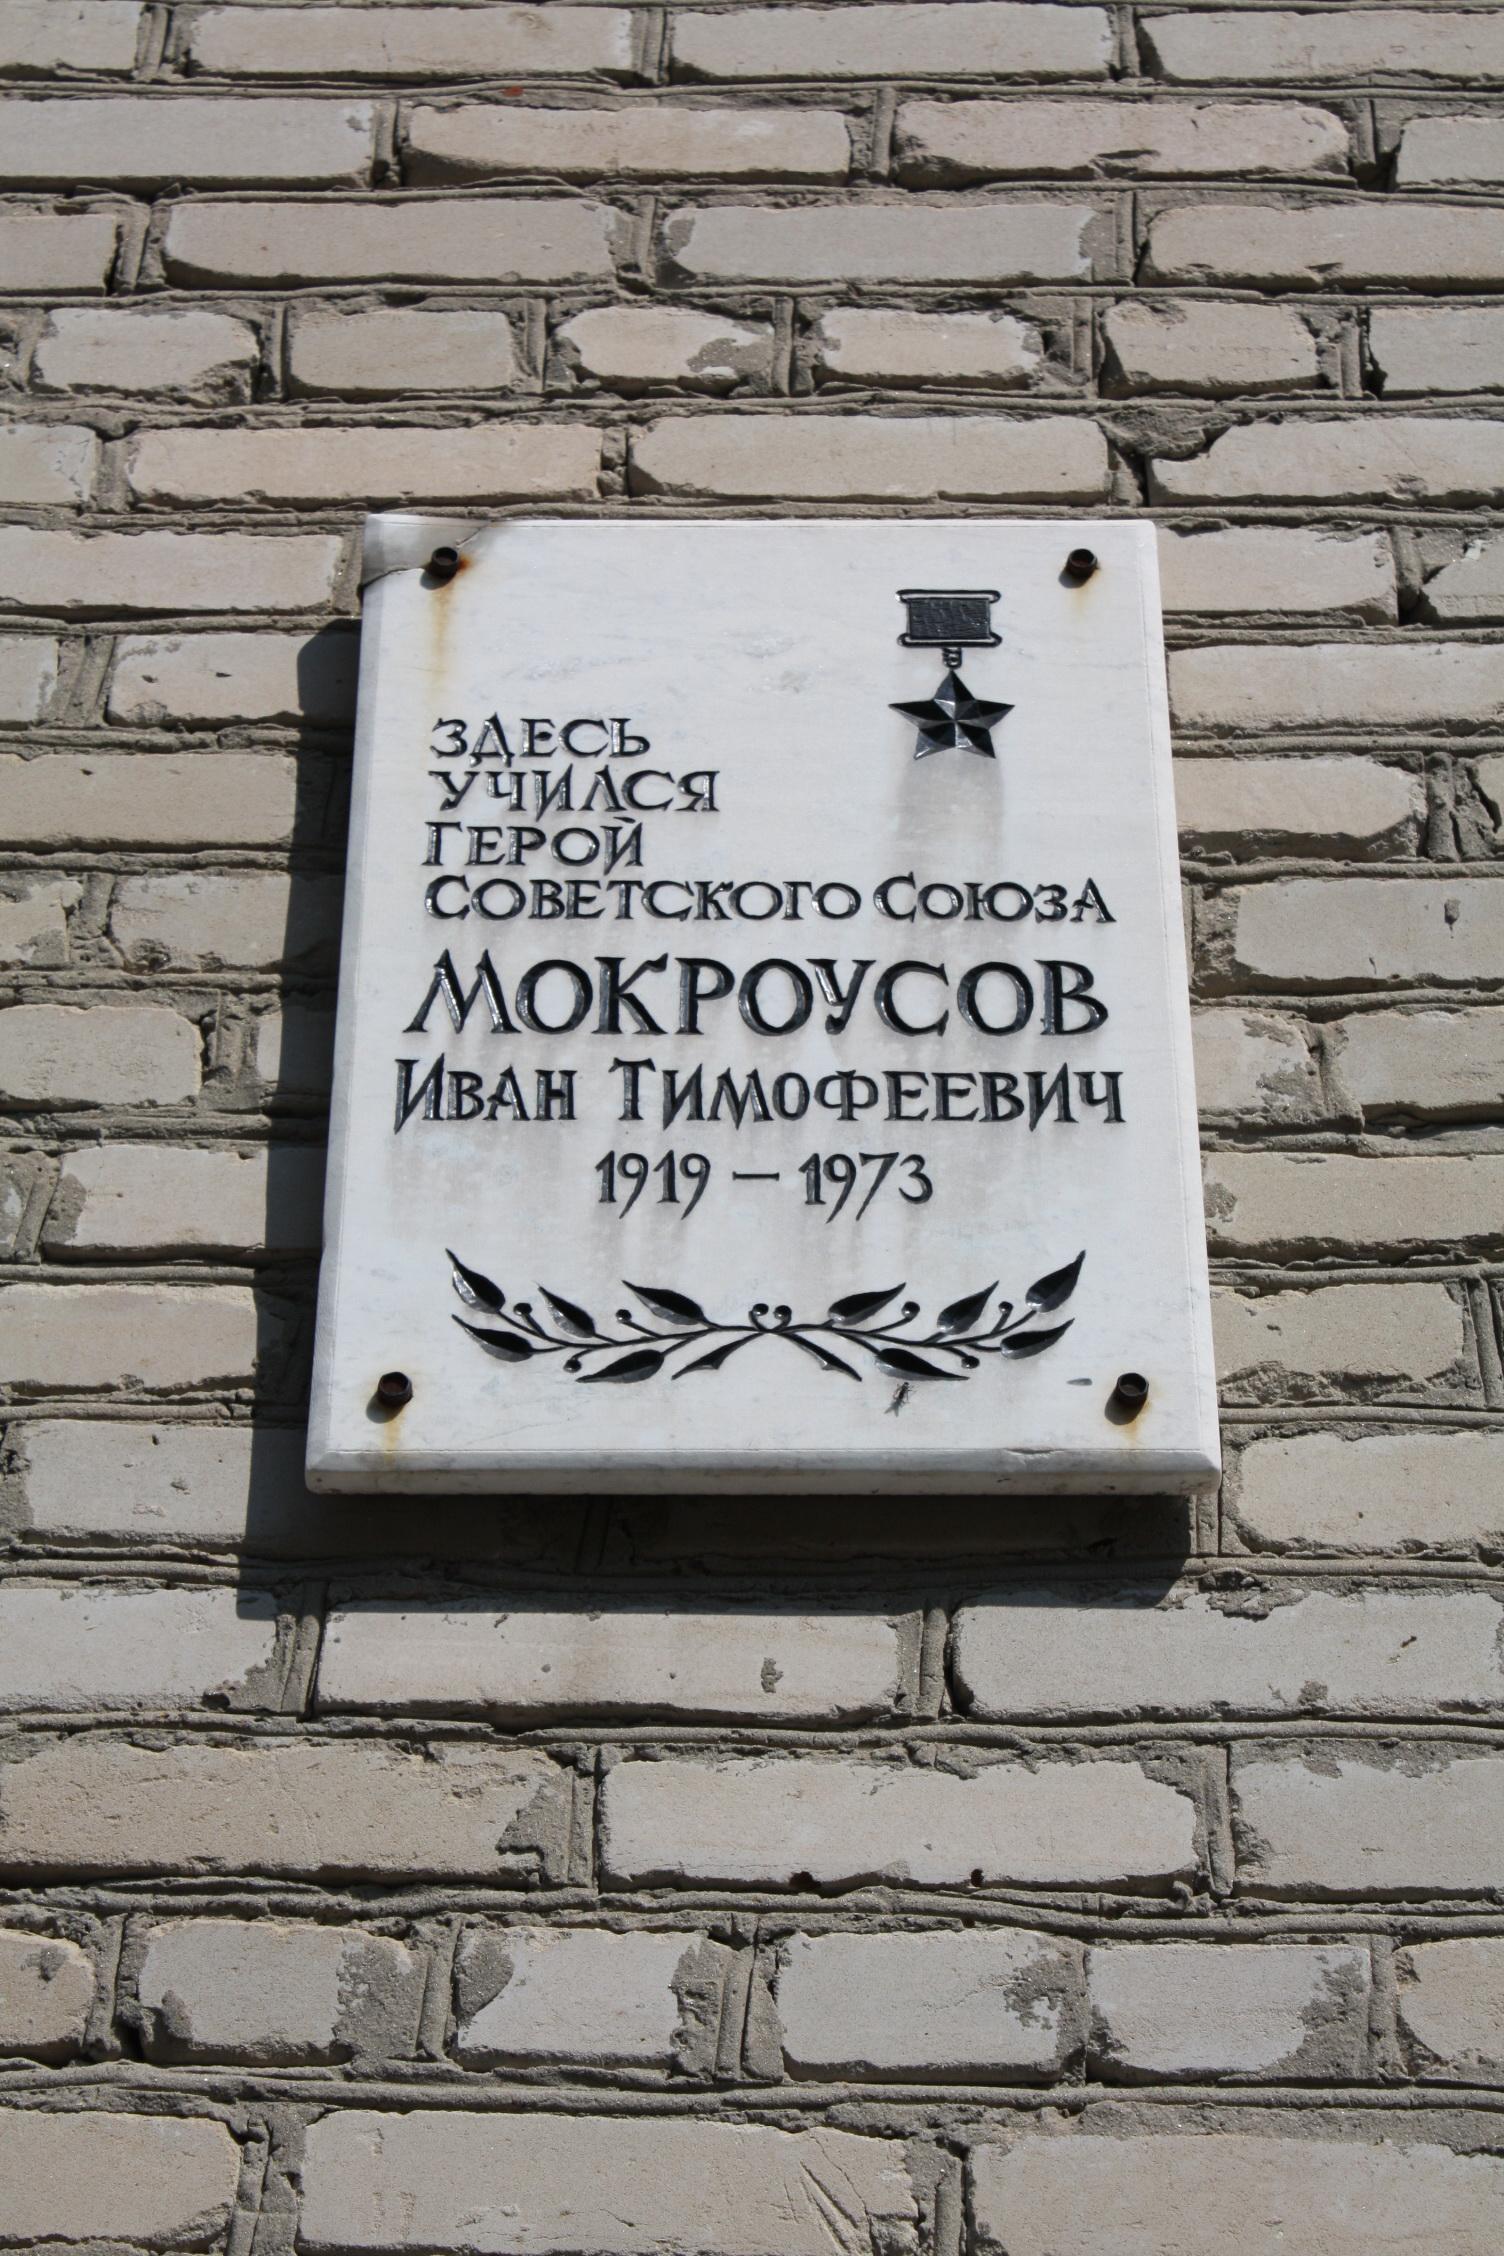 https://upload.wikimedia.org/wikipedia/commons/f/f1/Mokrousov_rahm.jpg